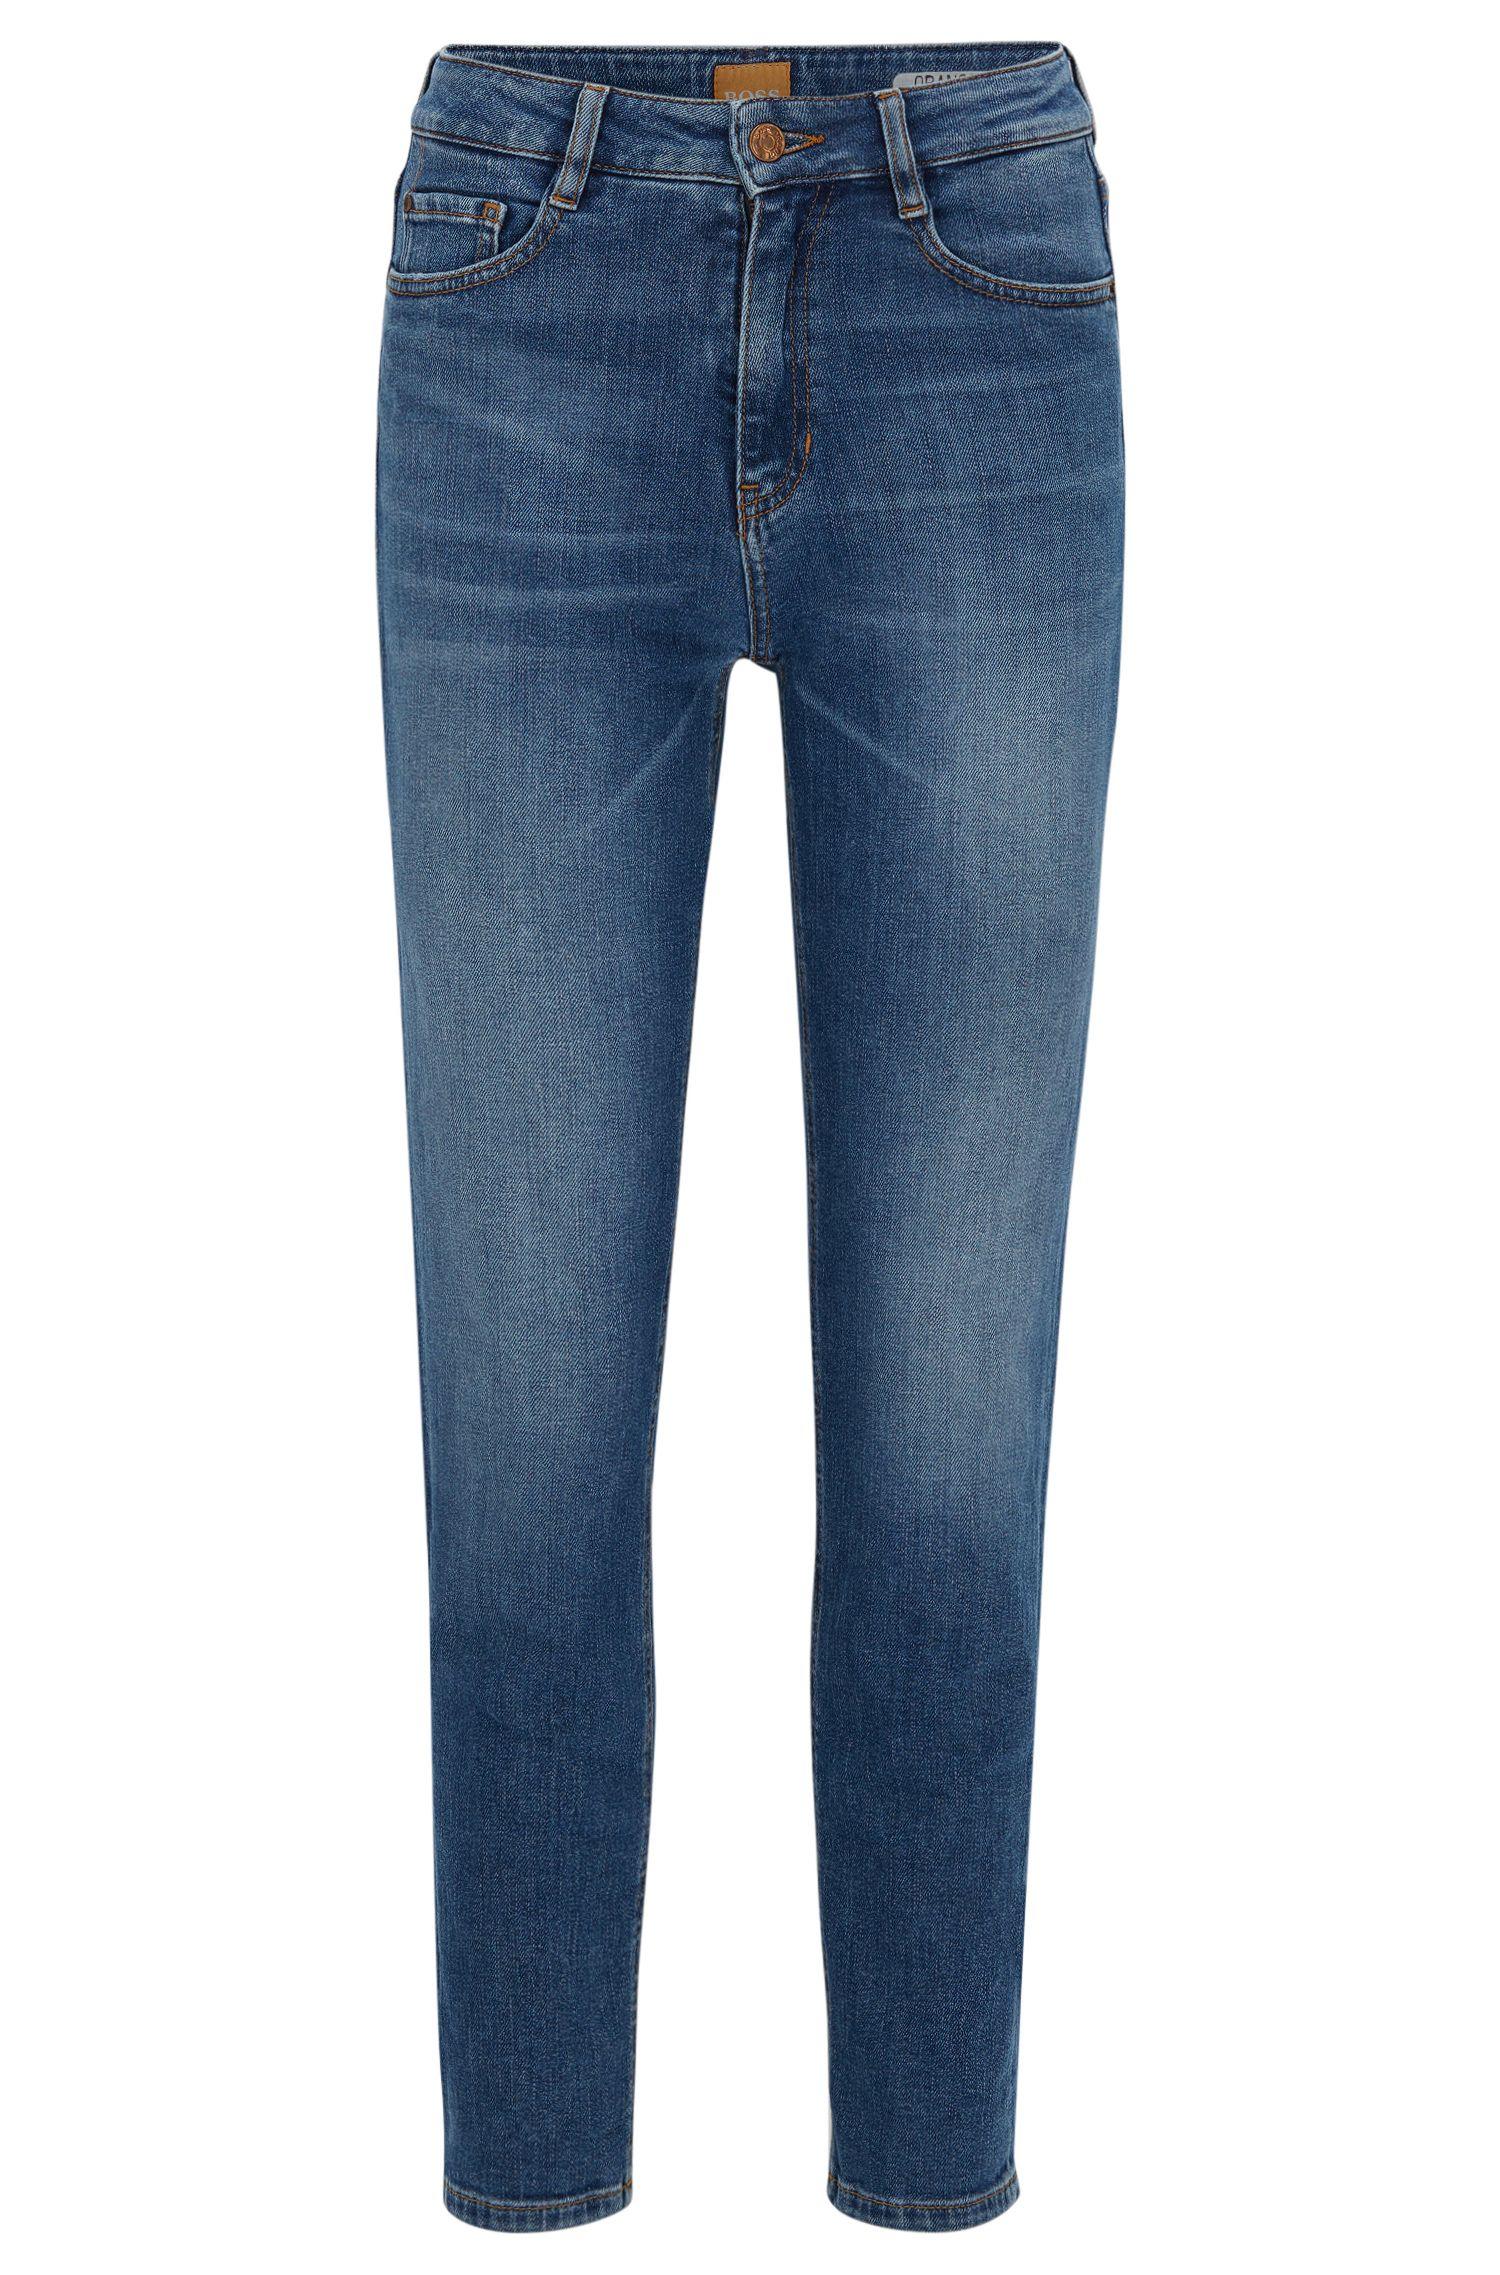 Jeans Tapered Fit en denim flammé stretch